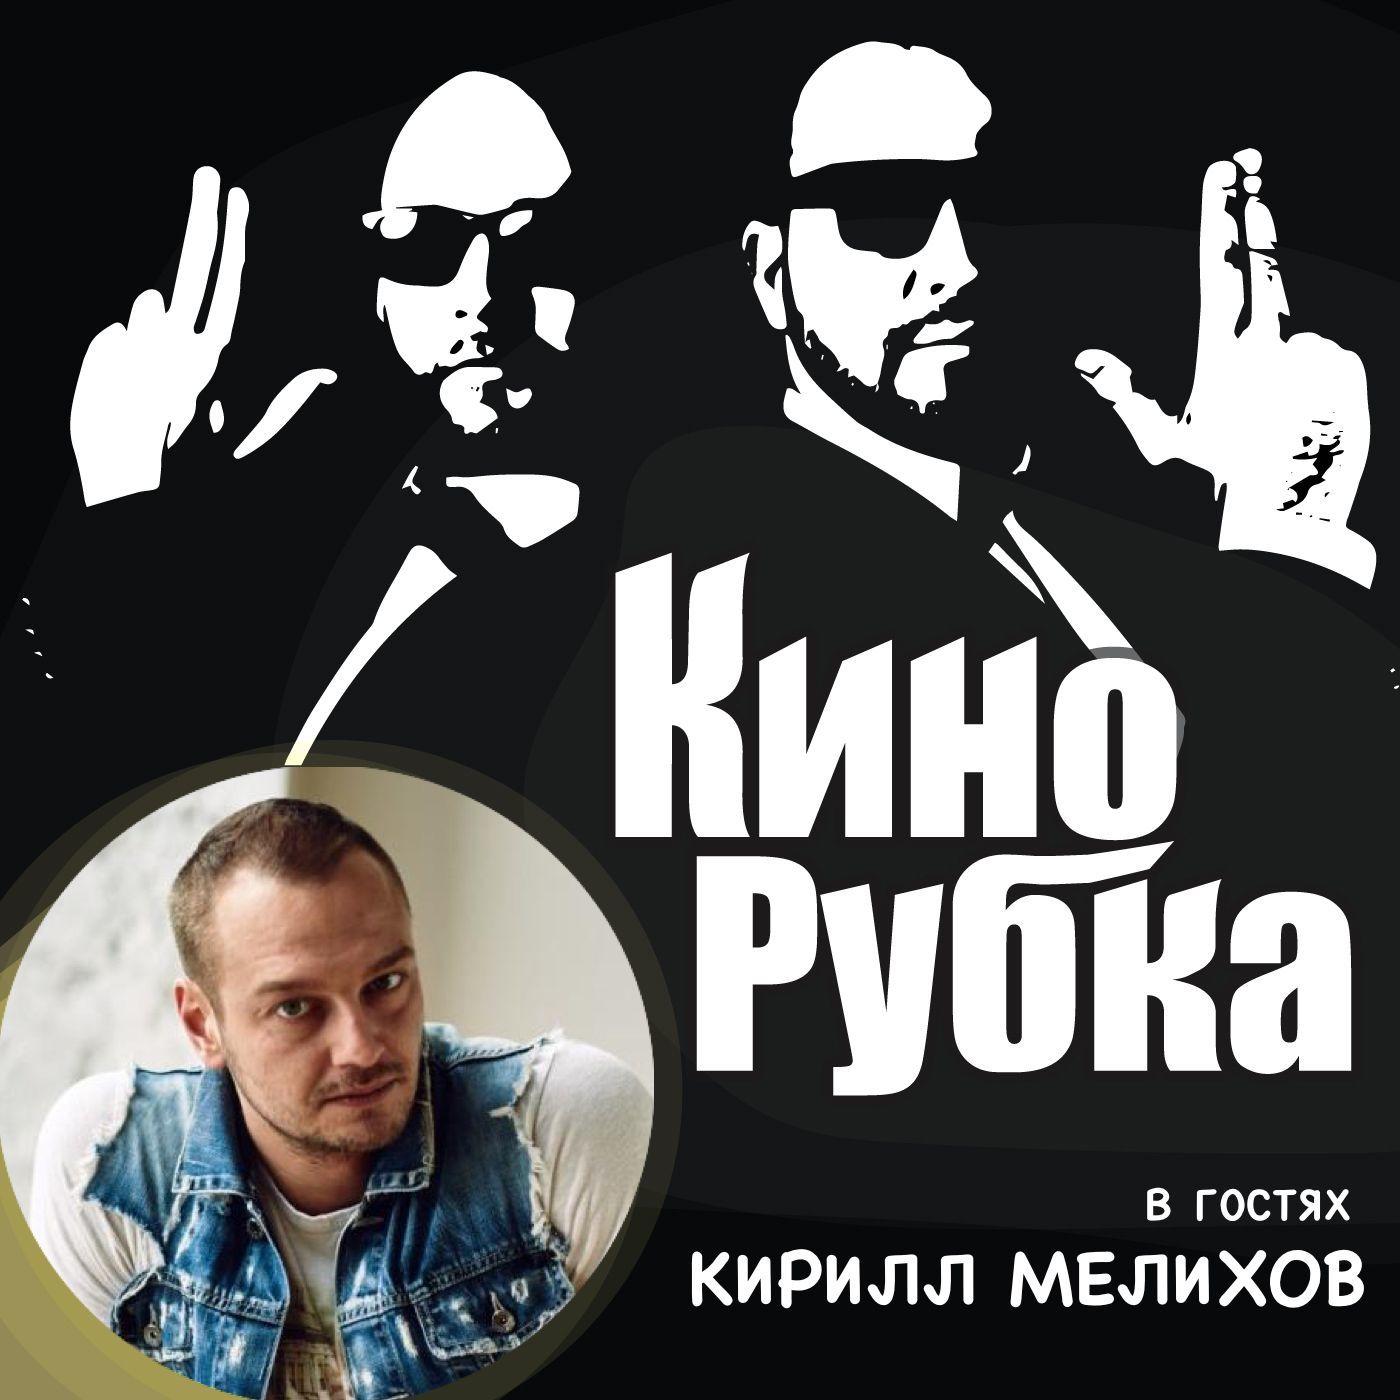 Актер кино Кирилл Мелихов